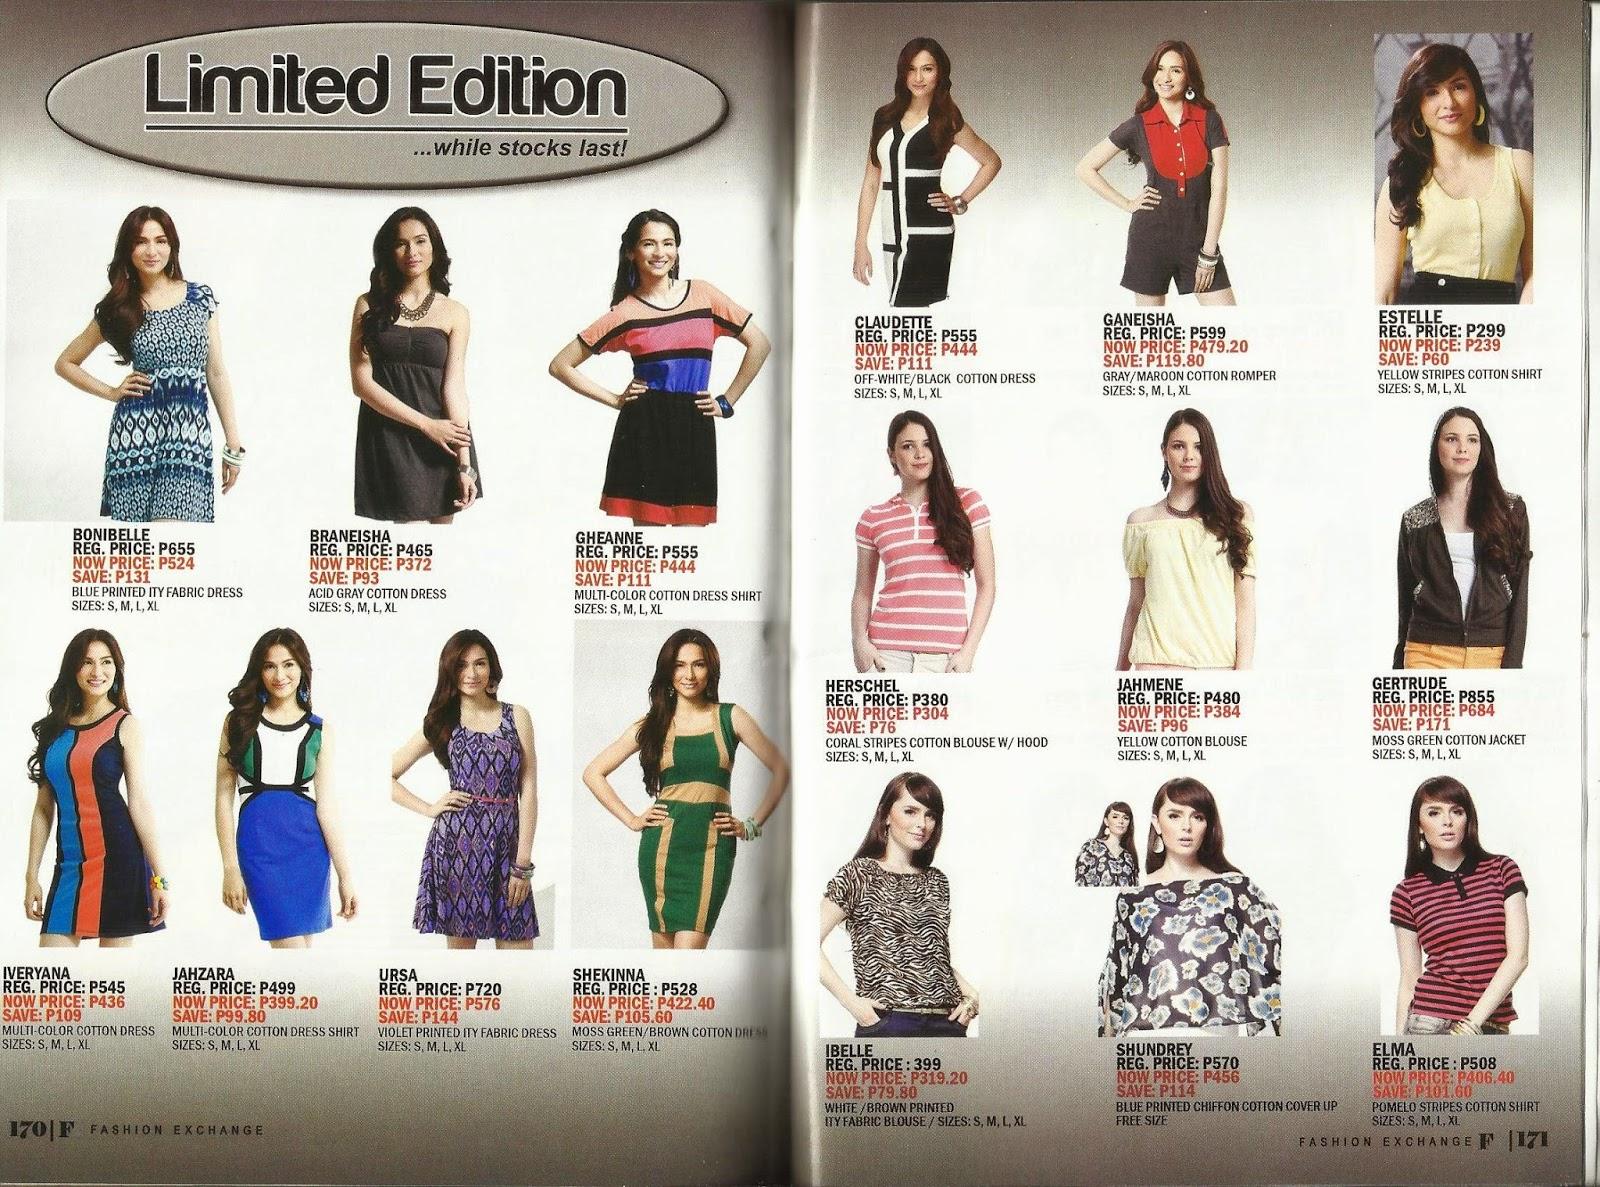 Image Wallpaper » Fashion Exchange